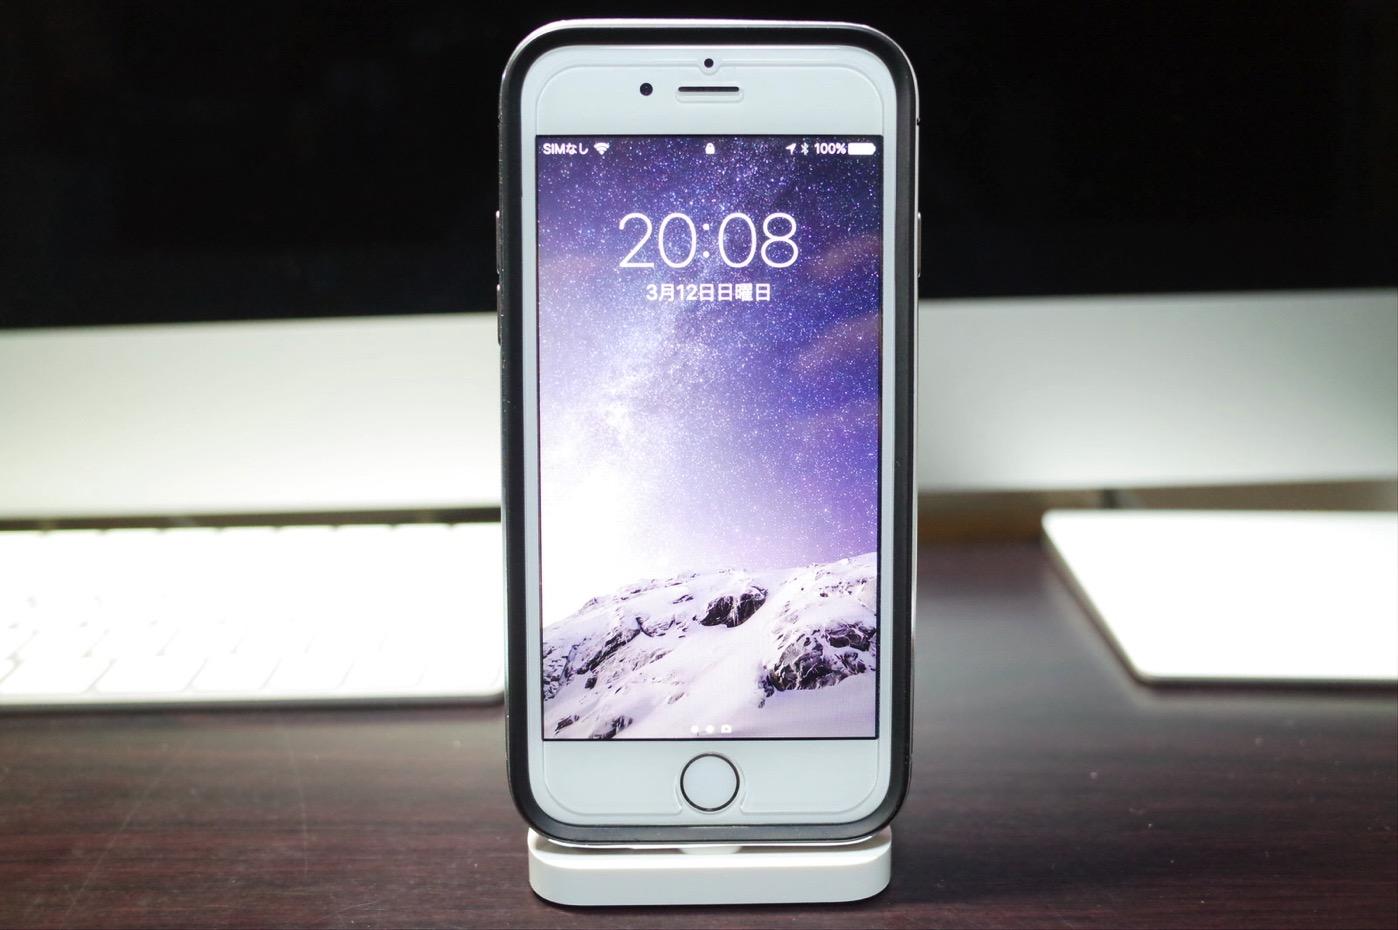 【Spigen】 iPhone7 ケース, ネオ・ハイブリッド [ 米軍MIL規格取得 二重構造 バンパー ] アイフォン 7 用 カバー (iPhone7, ガンメタル)-7